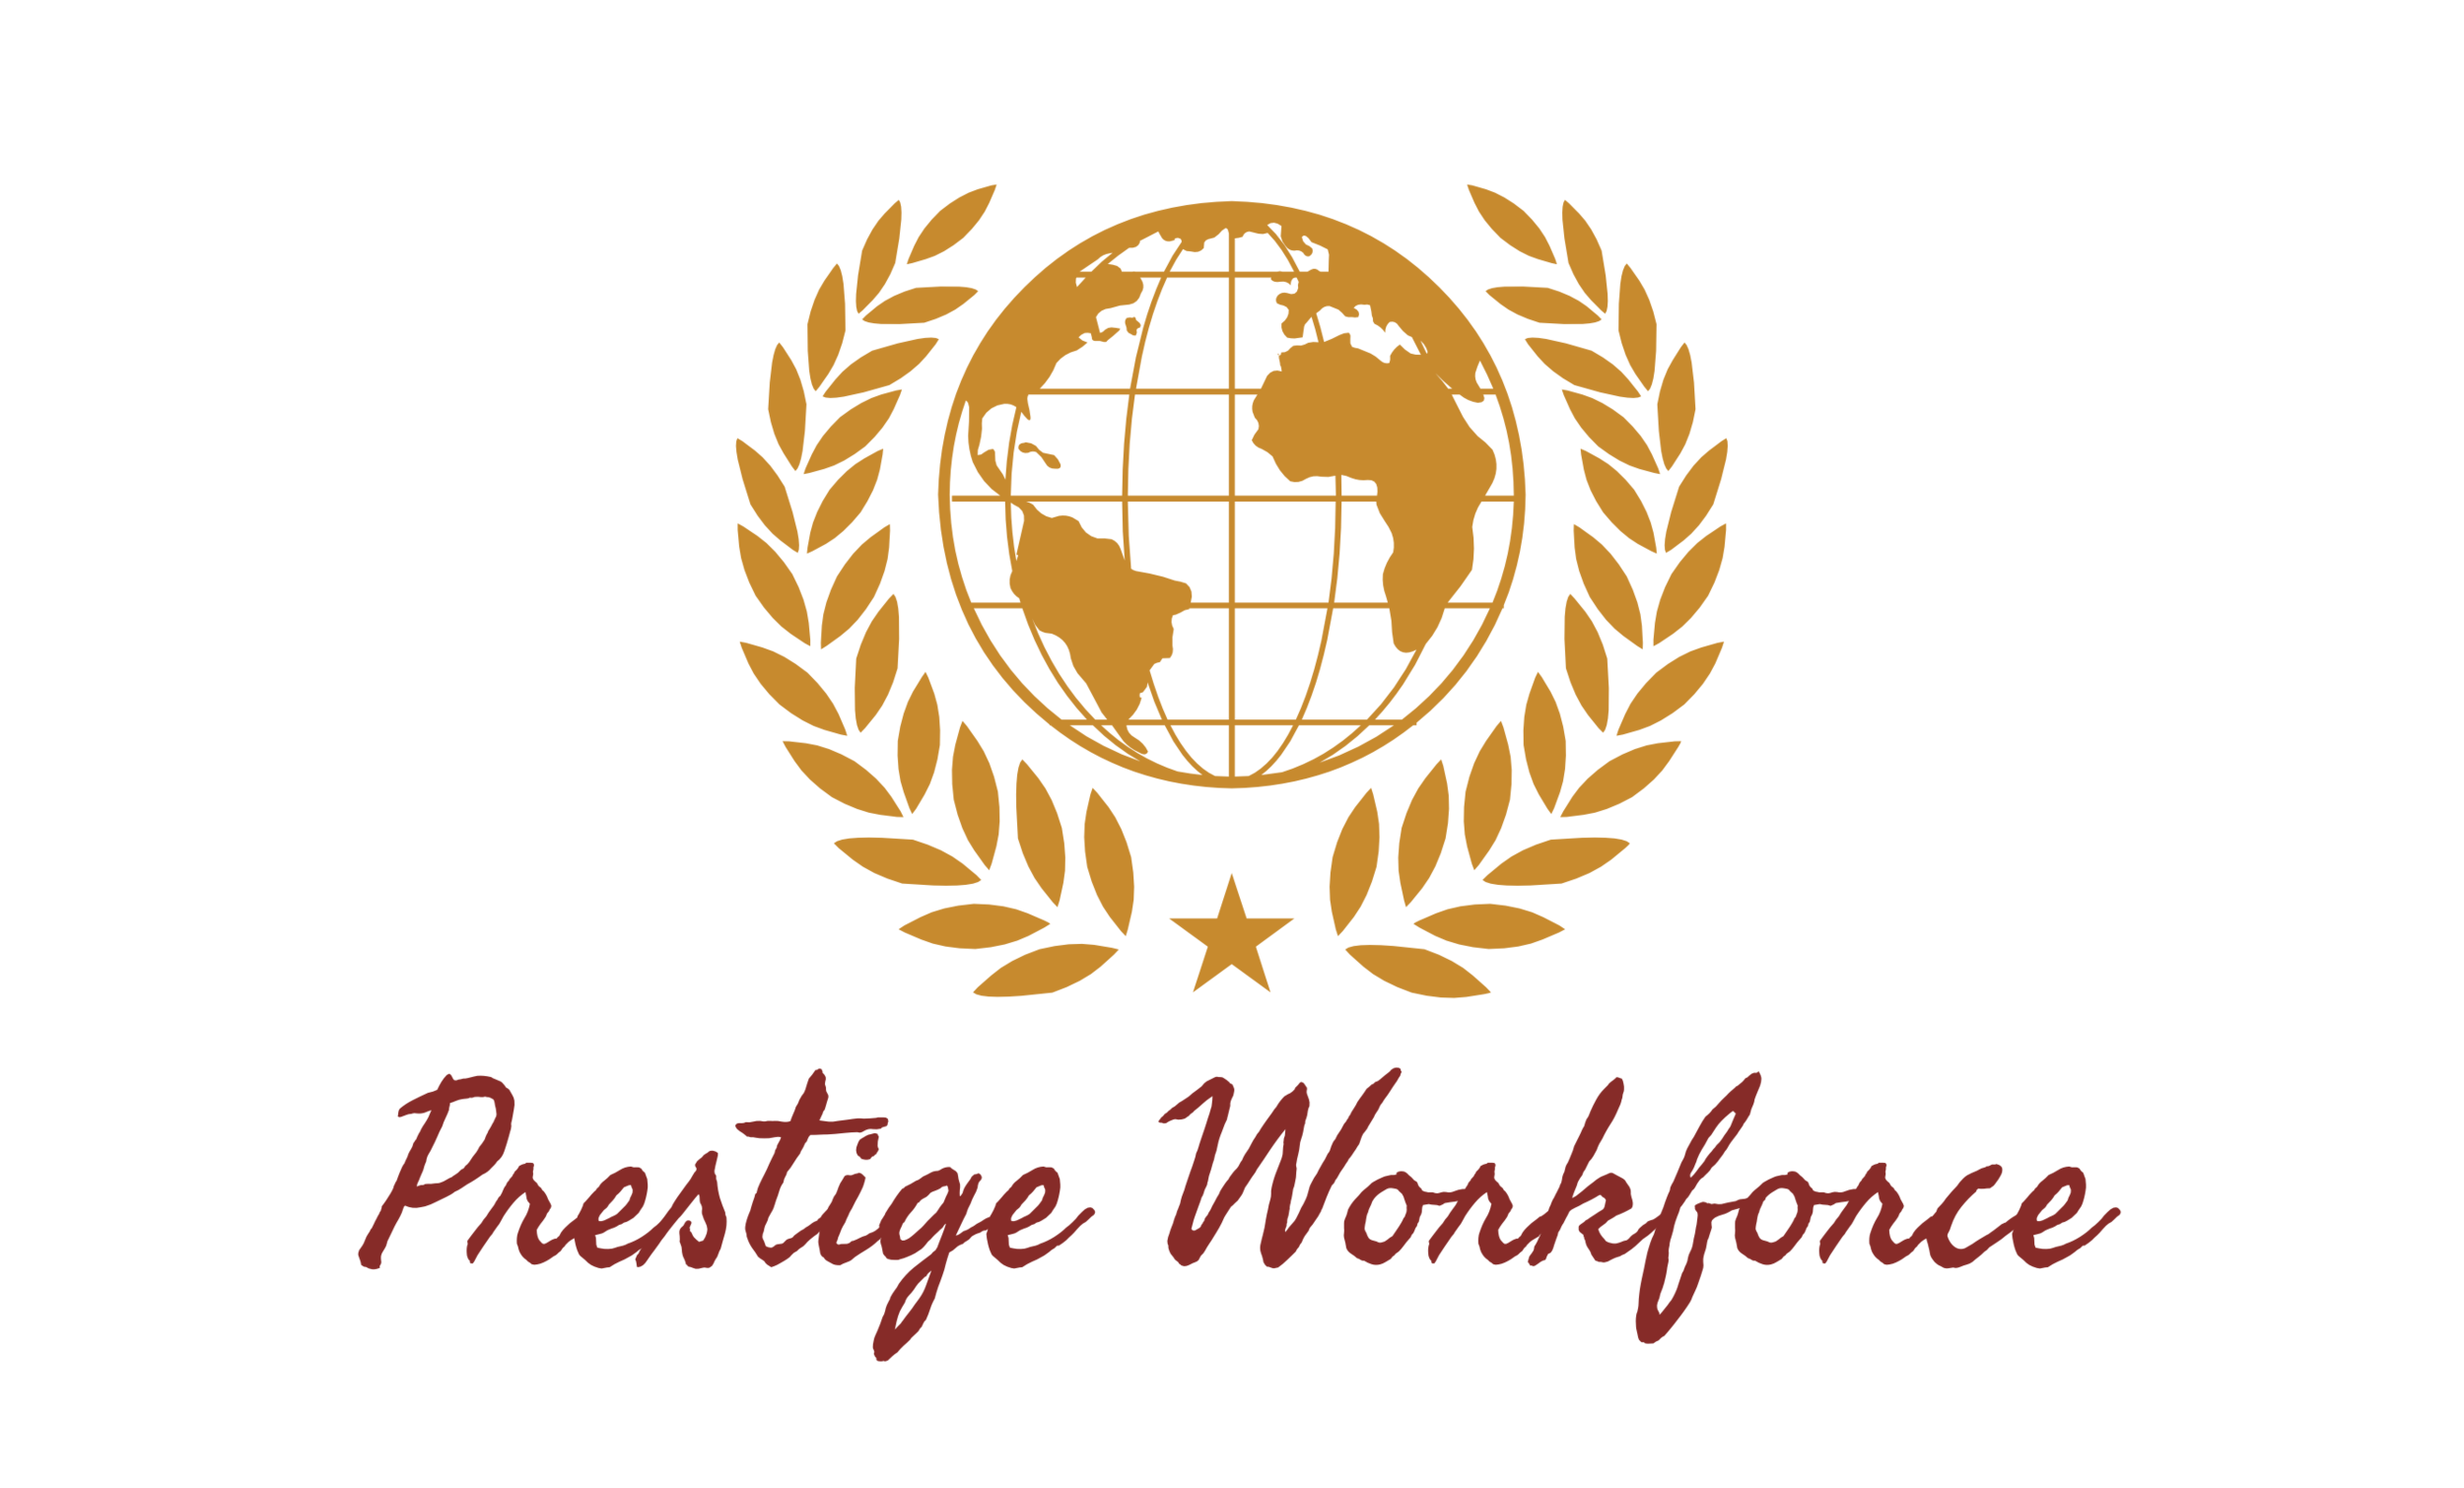 Prestige Workforce